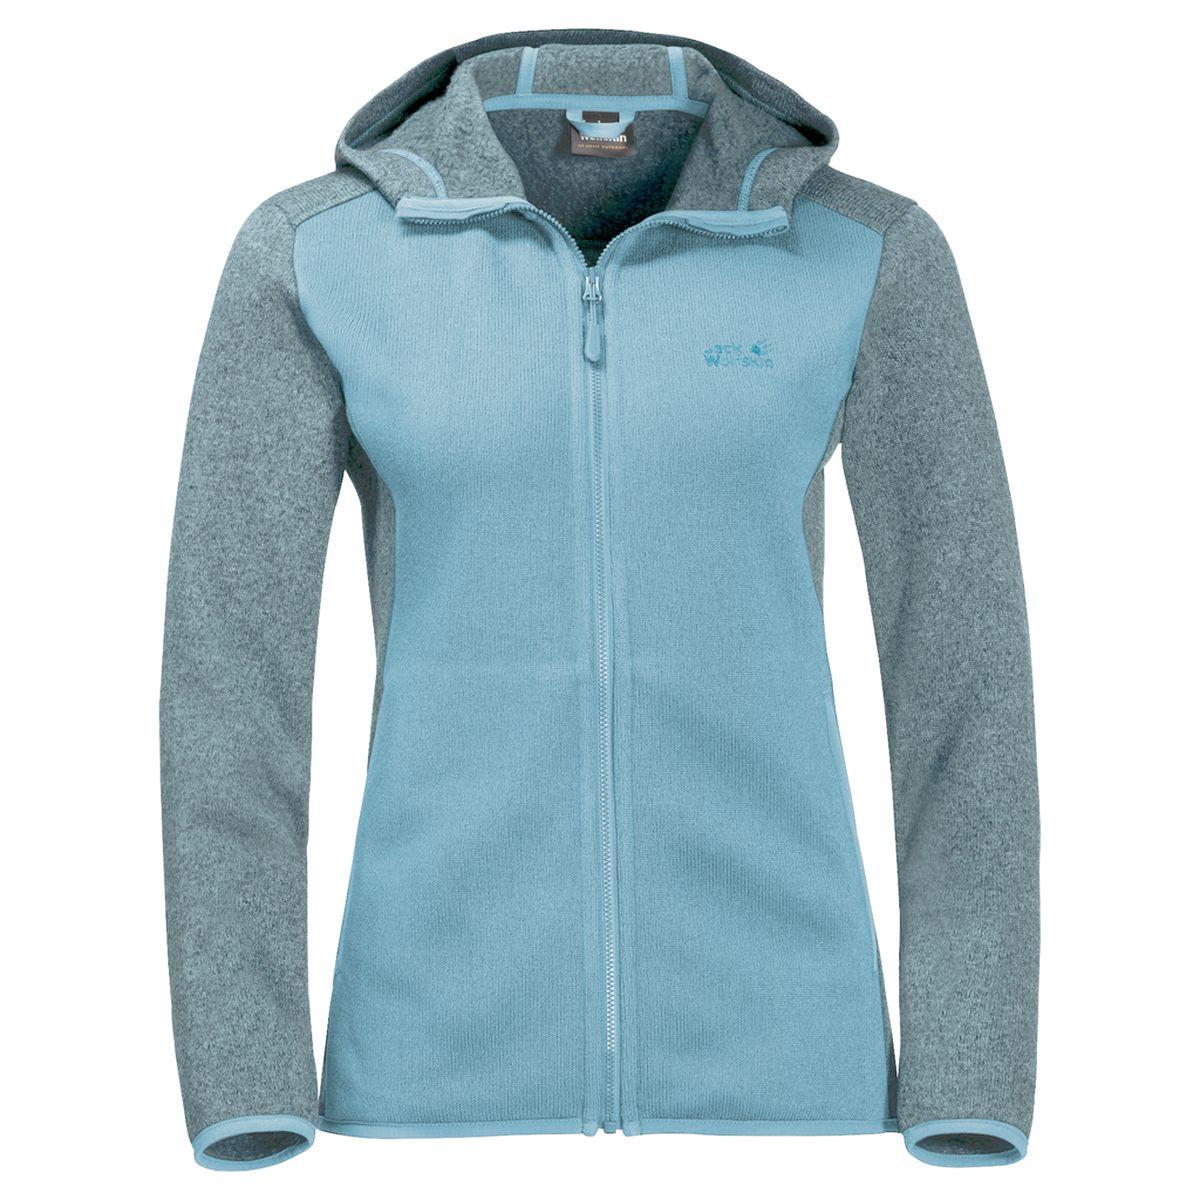 Толстовка Jack Wolfskin толстовка мужская jack wolfskin elk hooded jacket men цвет синий 1707101 1134 размер l 48 50